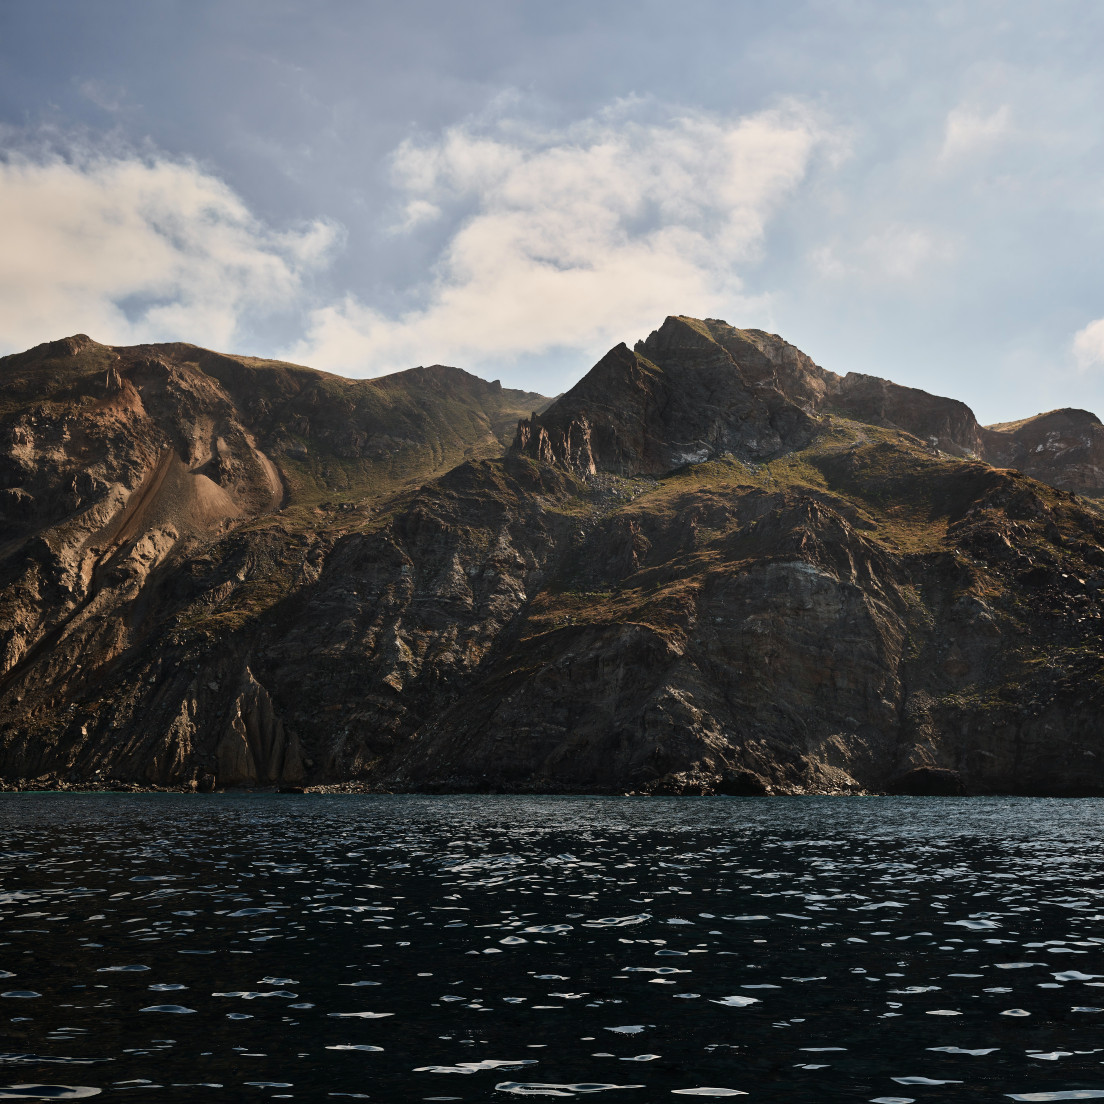 Download 7 new Beautiful Catalina Desktop Wallpapers for macOS 10.15